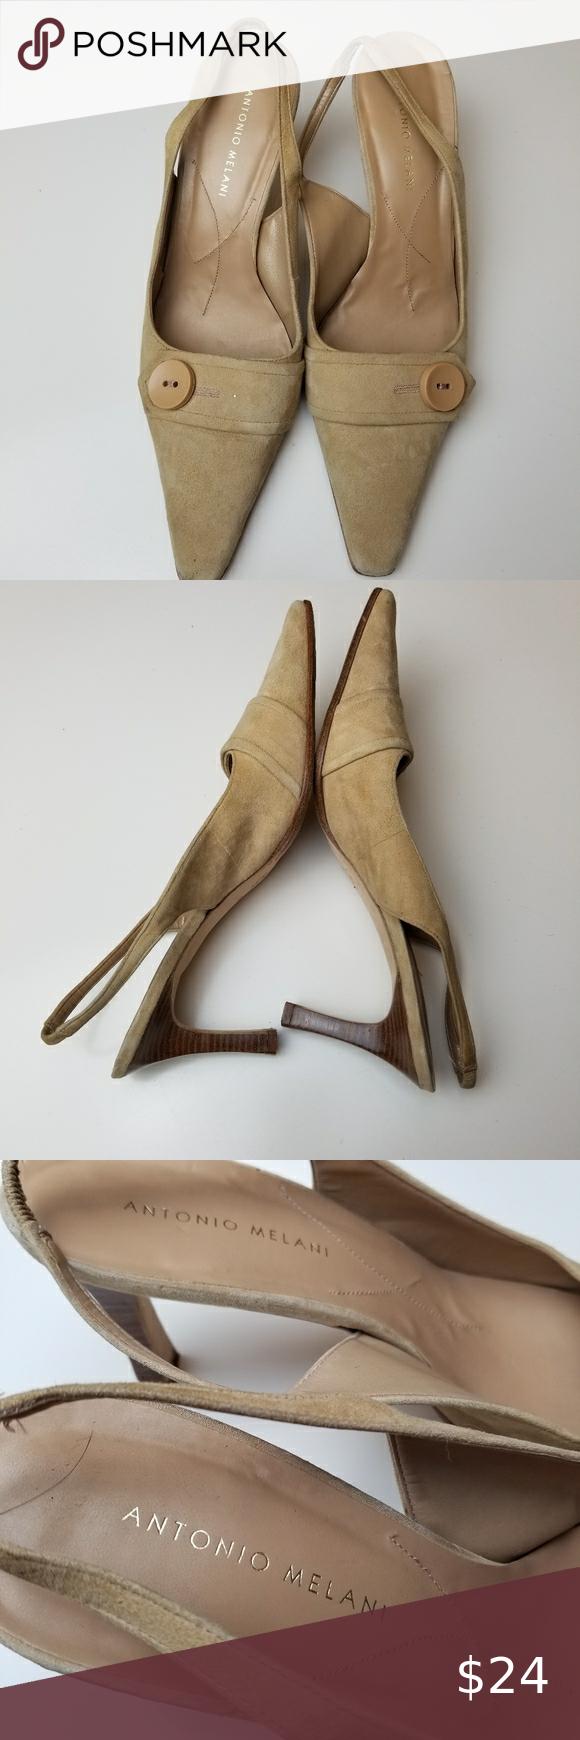 Antonio Melani Slingback Heels Size 10 In 2020 Slingback Heel Shoes Women Heels Heels